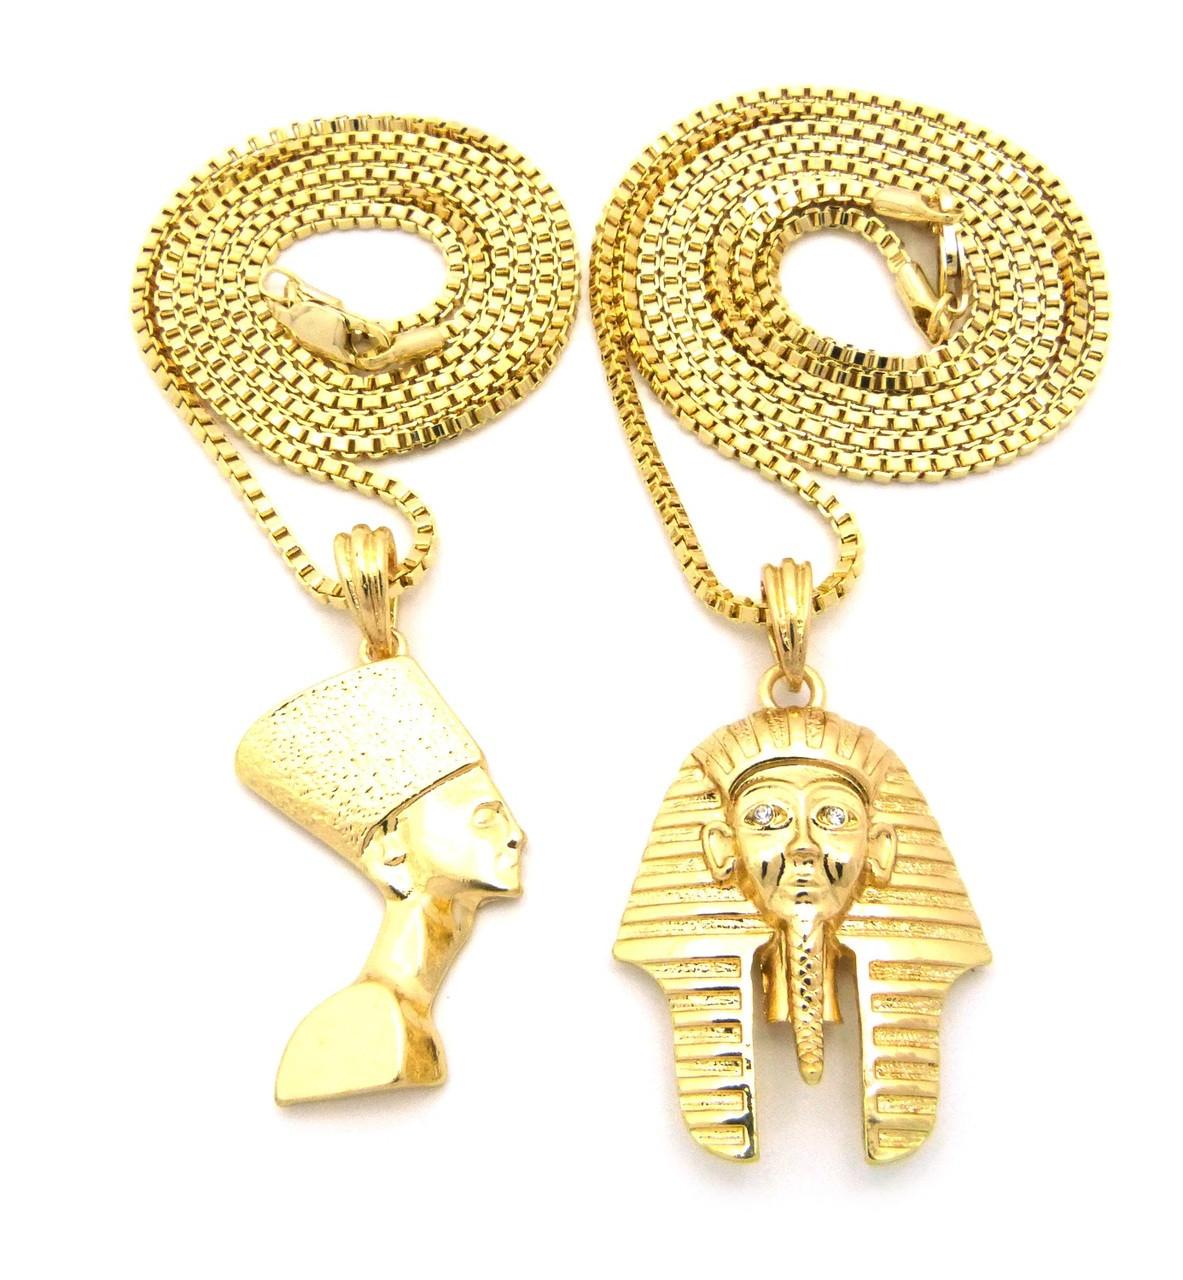 Egyptian king akhenaten queen nefertiti pendant chain mozeypictures Gallery